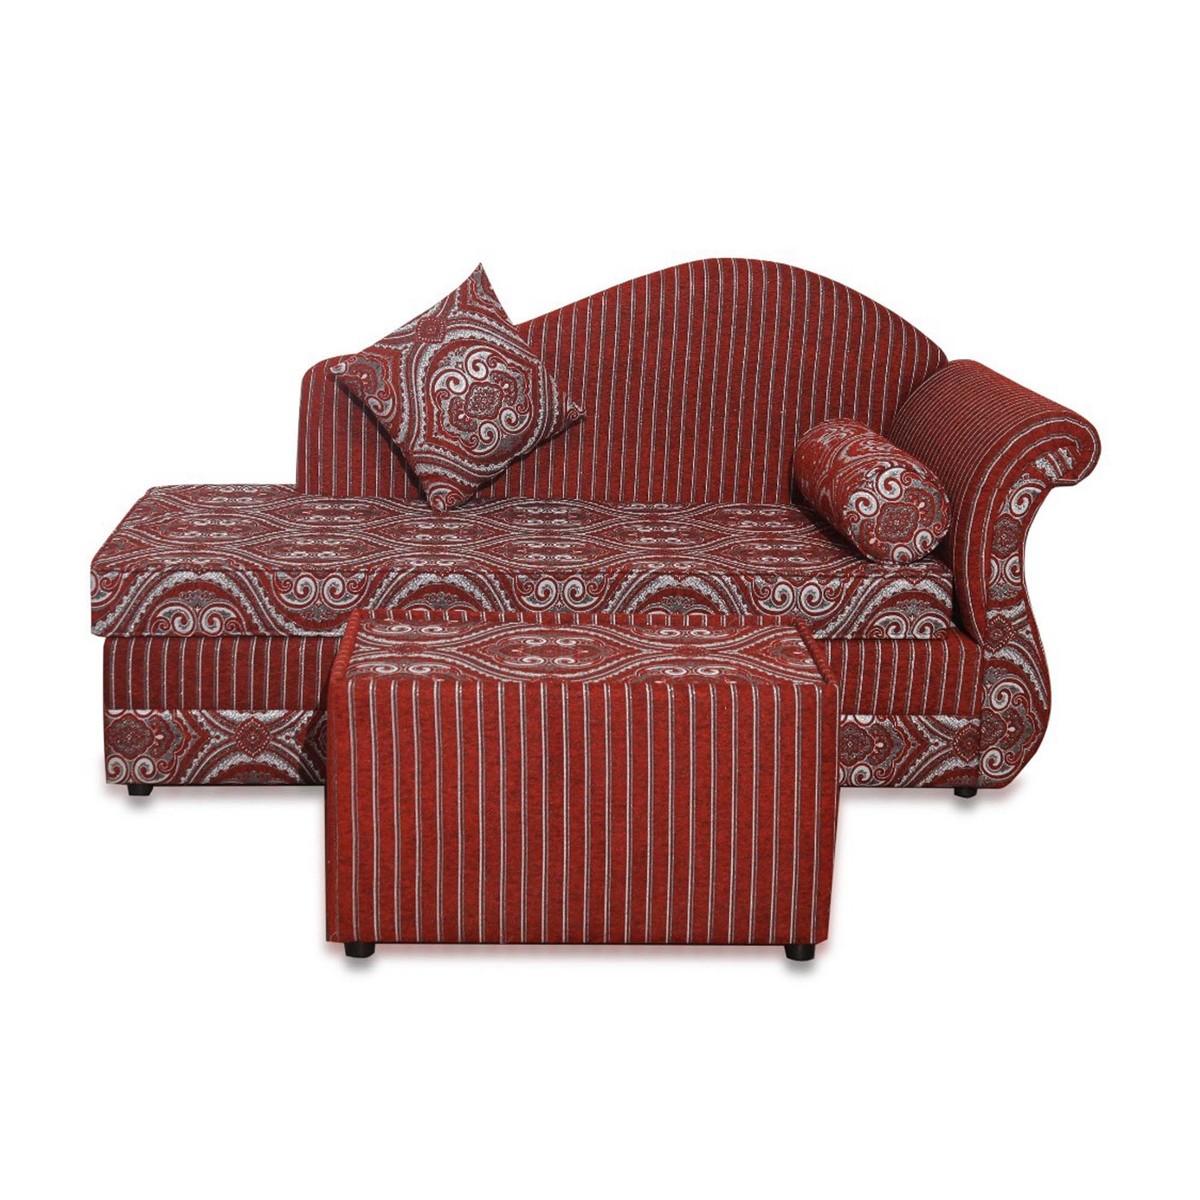 Design Plus Fabric Diwan Sofa Set Ml05 Red Online